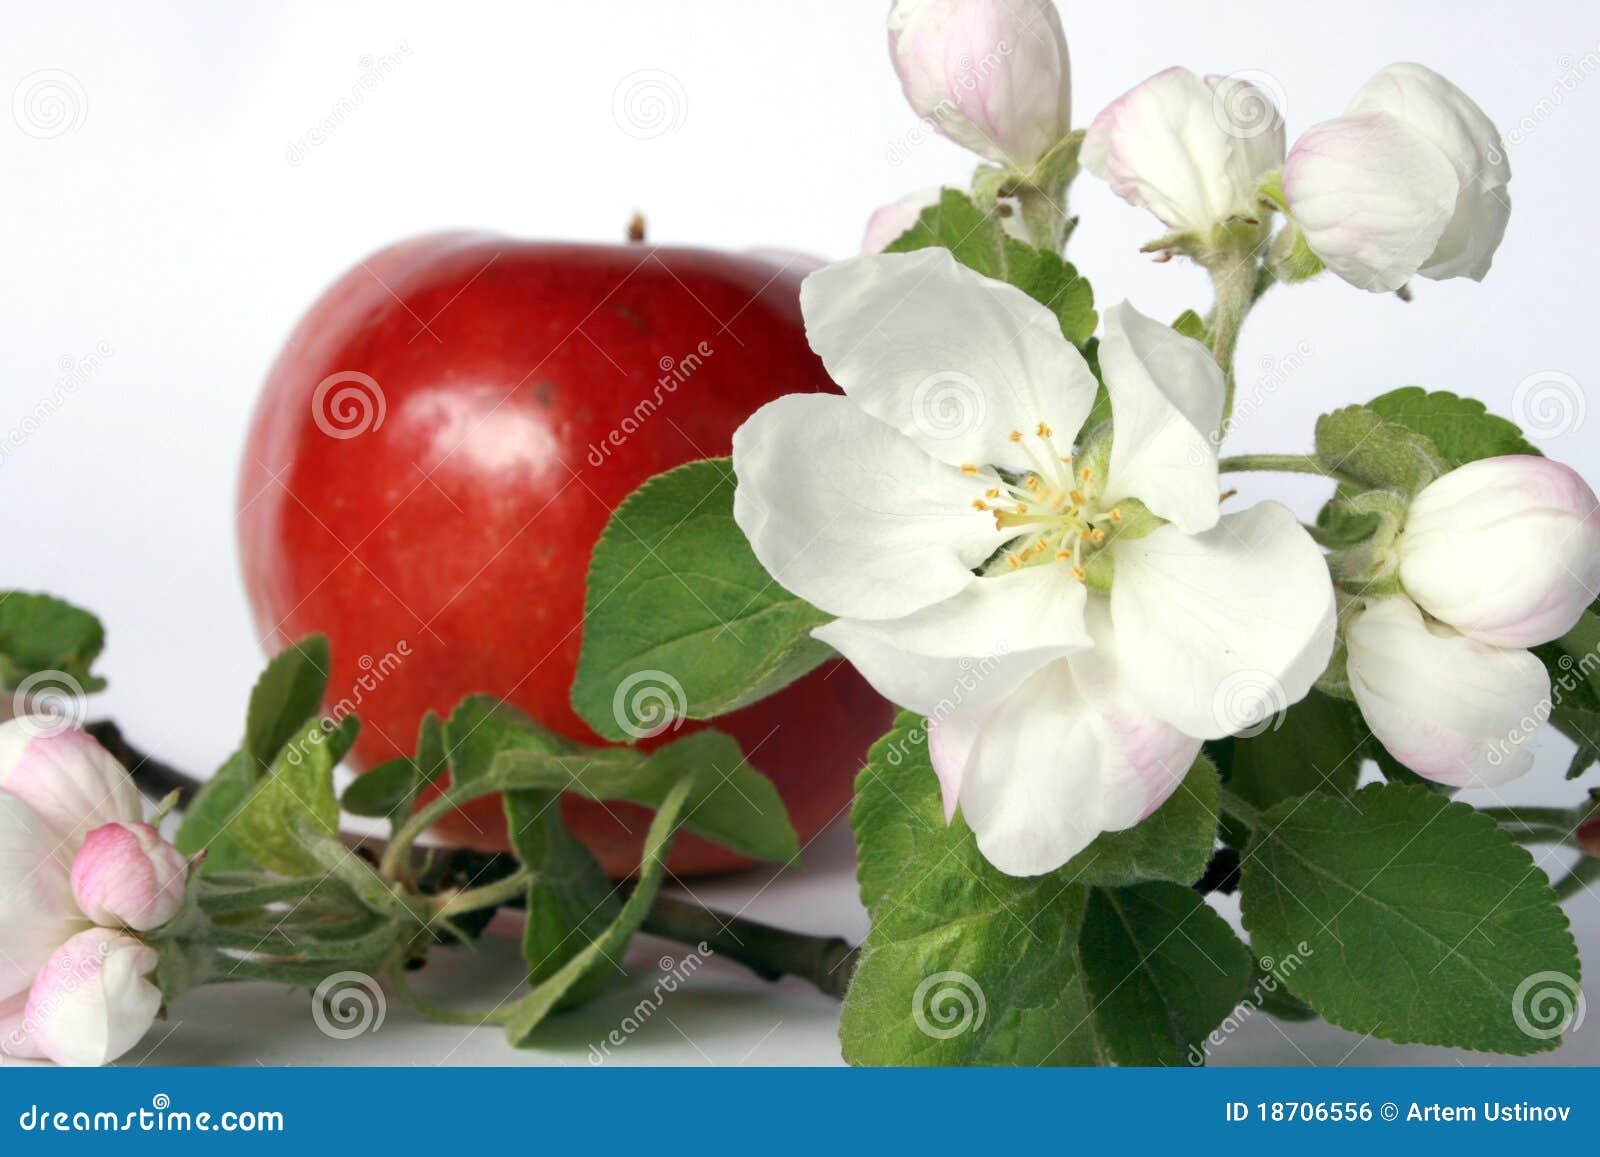 Flower And Fruit Royalty Free Stock Image Image 18706556